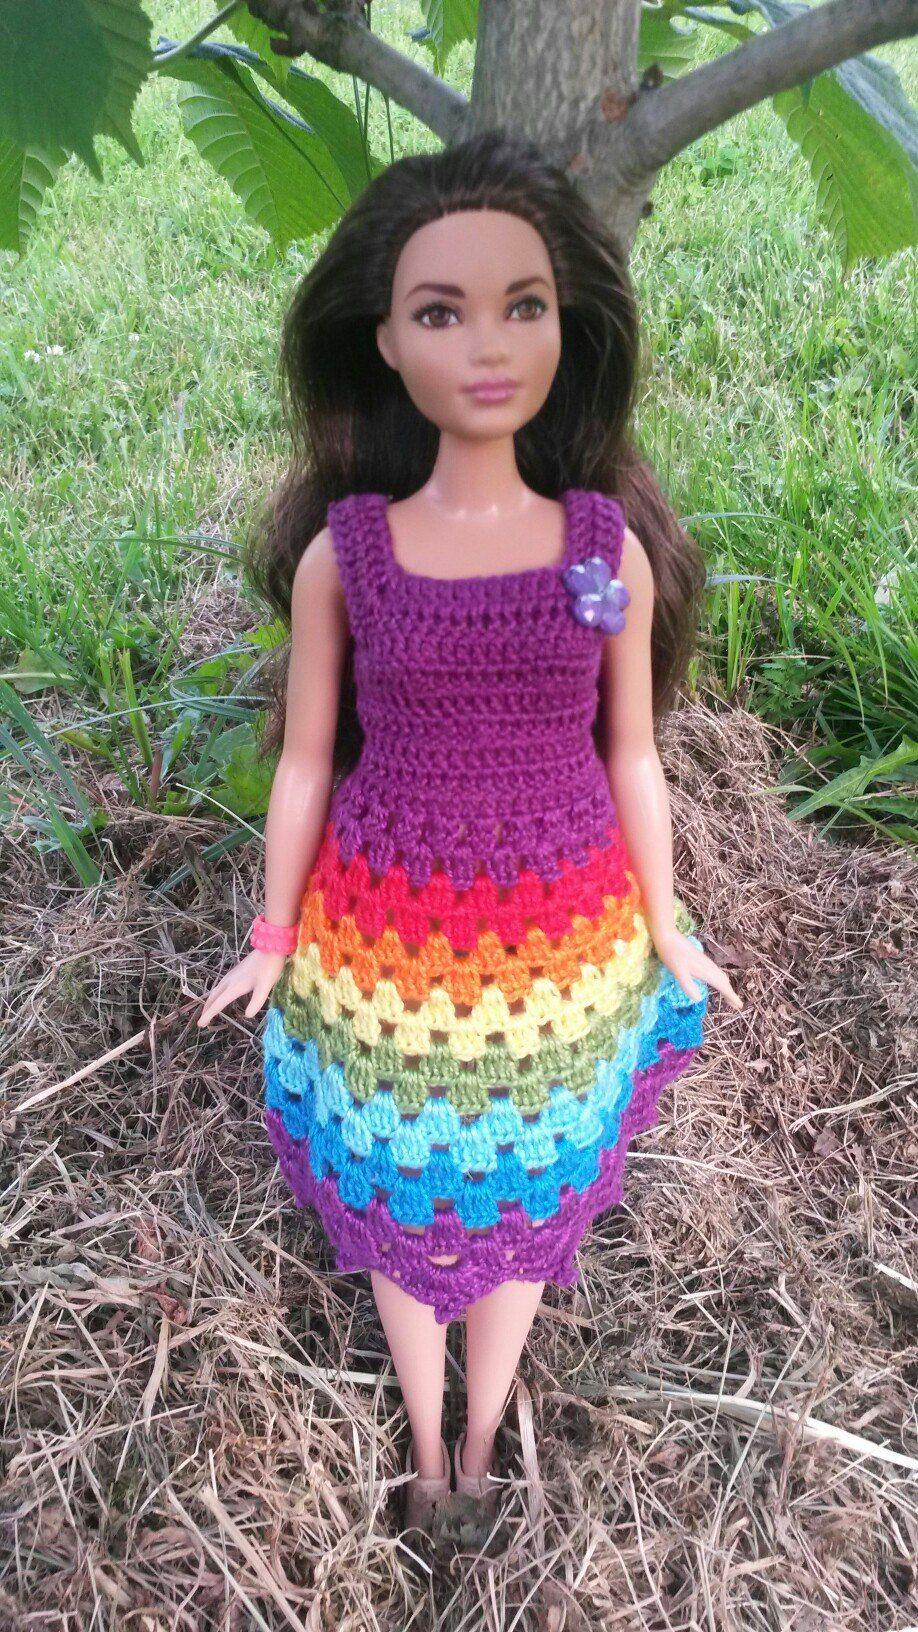 Одежда для кукол крючком и прочие мелочи | Barbie , Yareli Malinalli ...